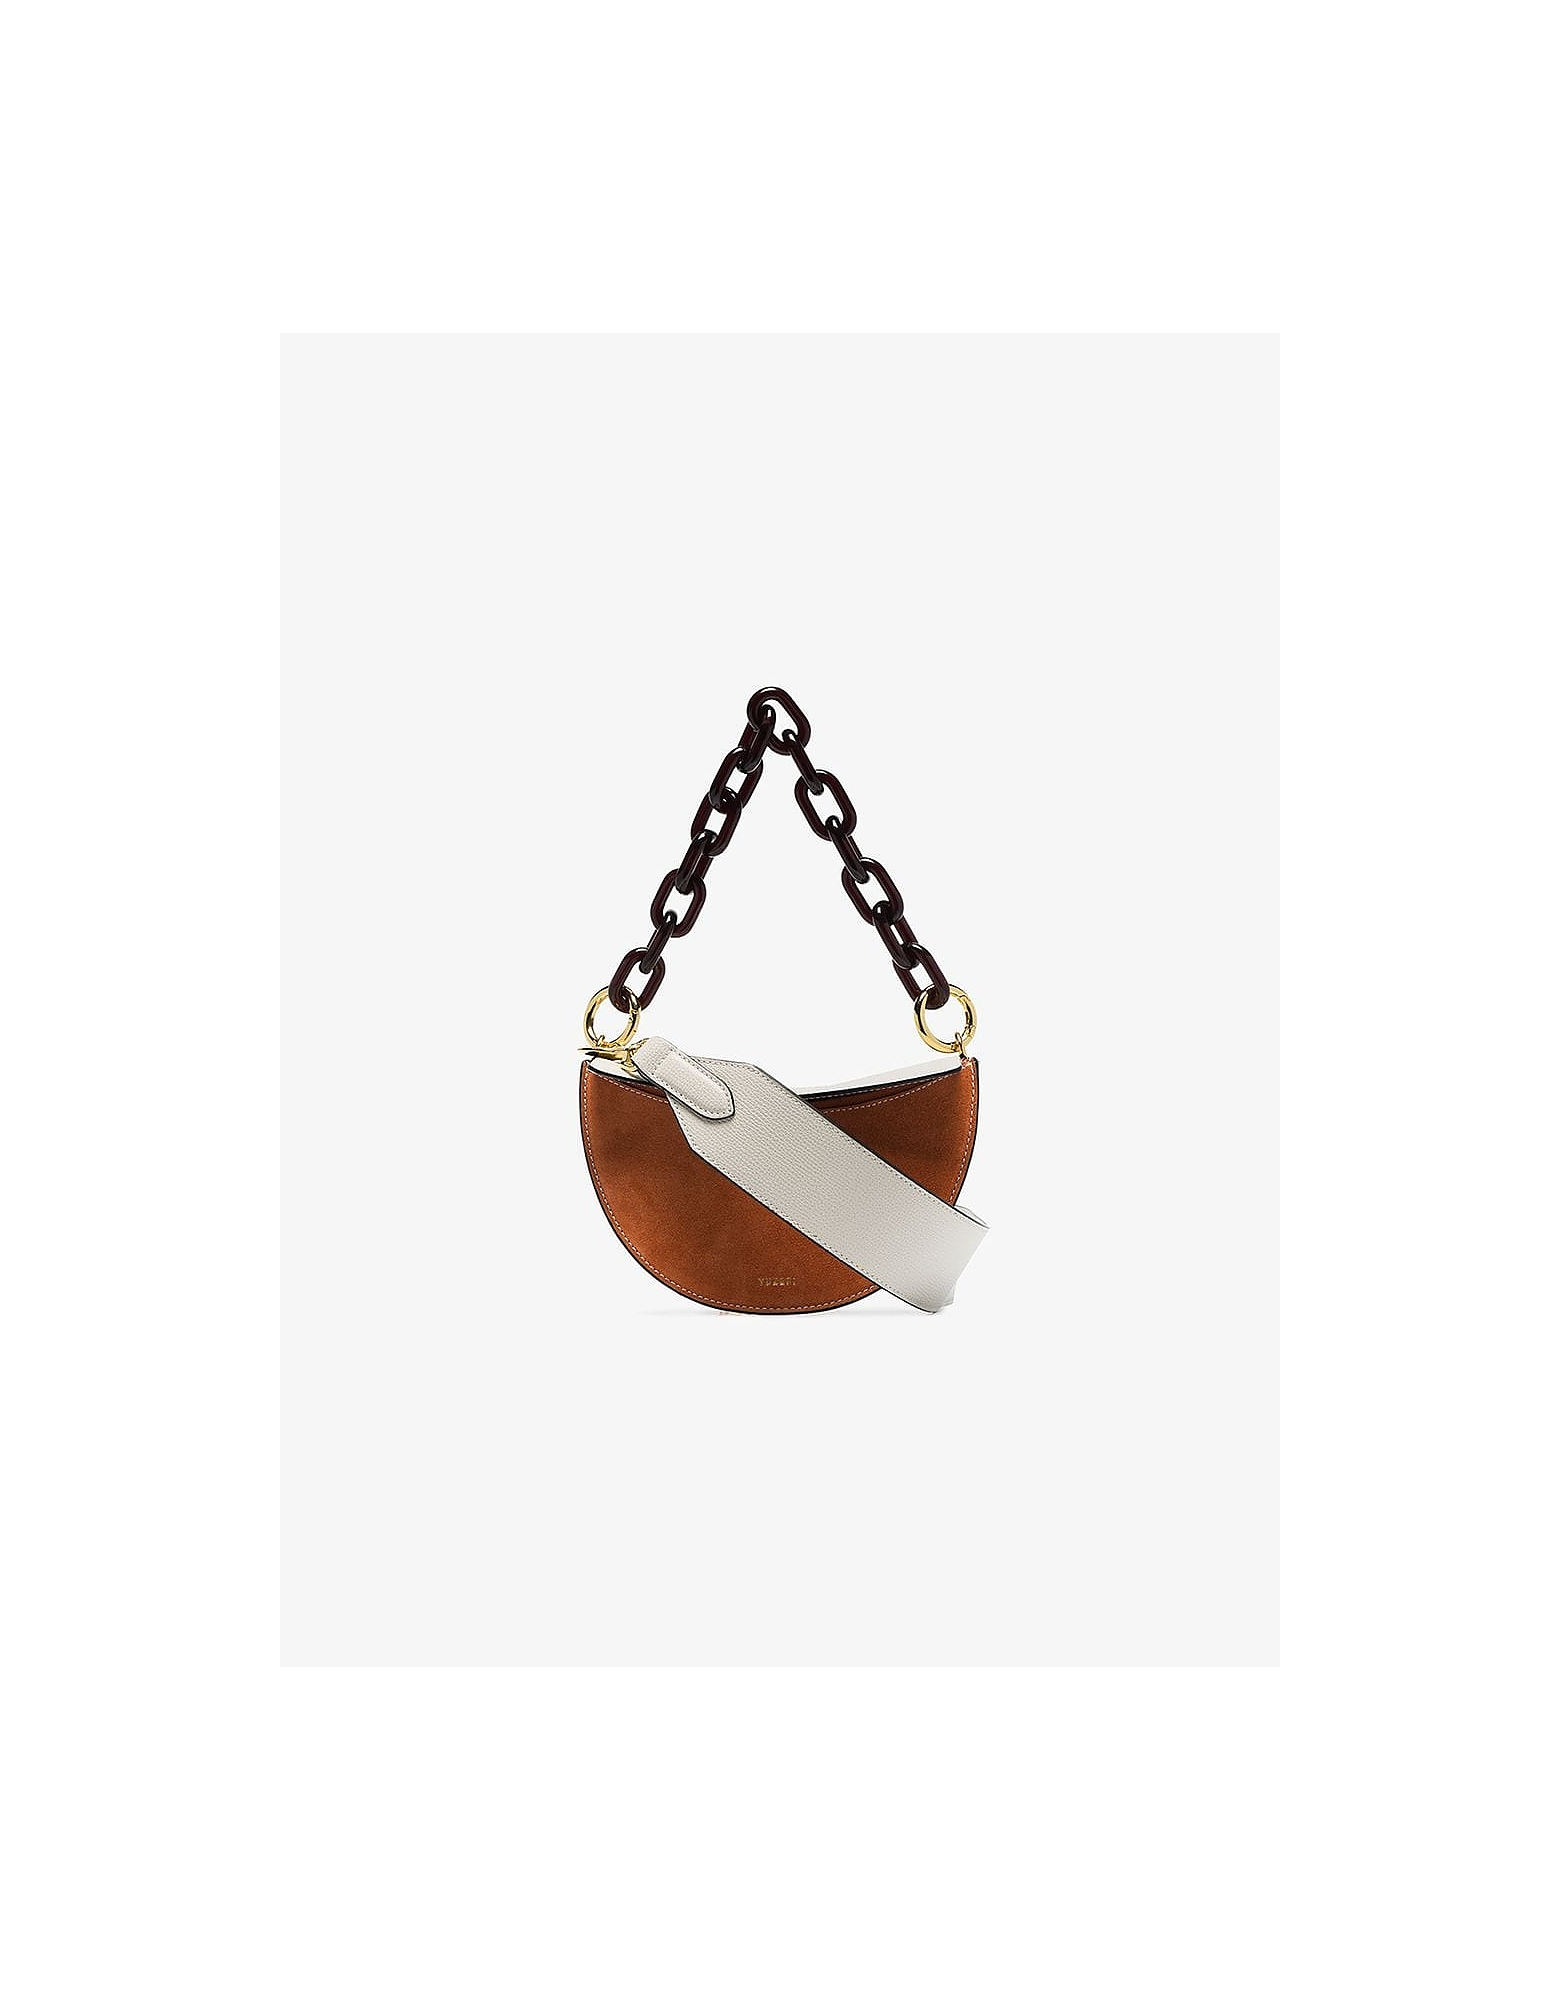 Yuzefi Designer Handbags, Multicoloured Doris Shoulder Bag